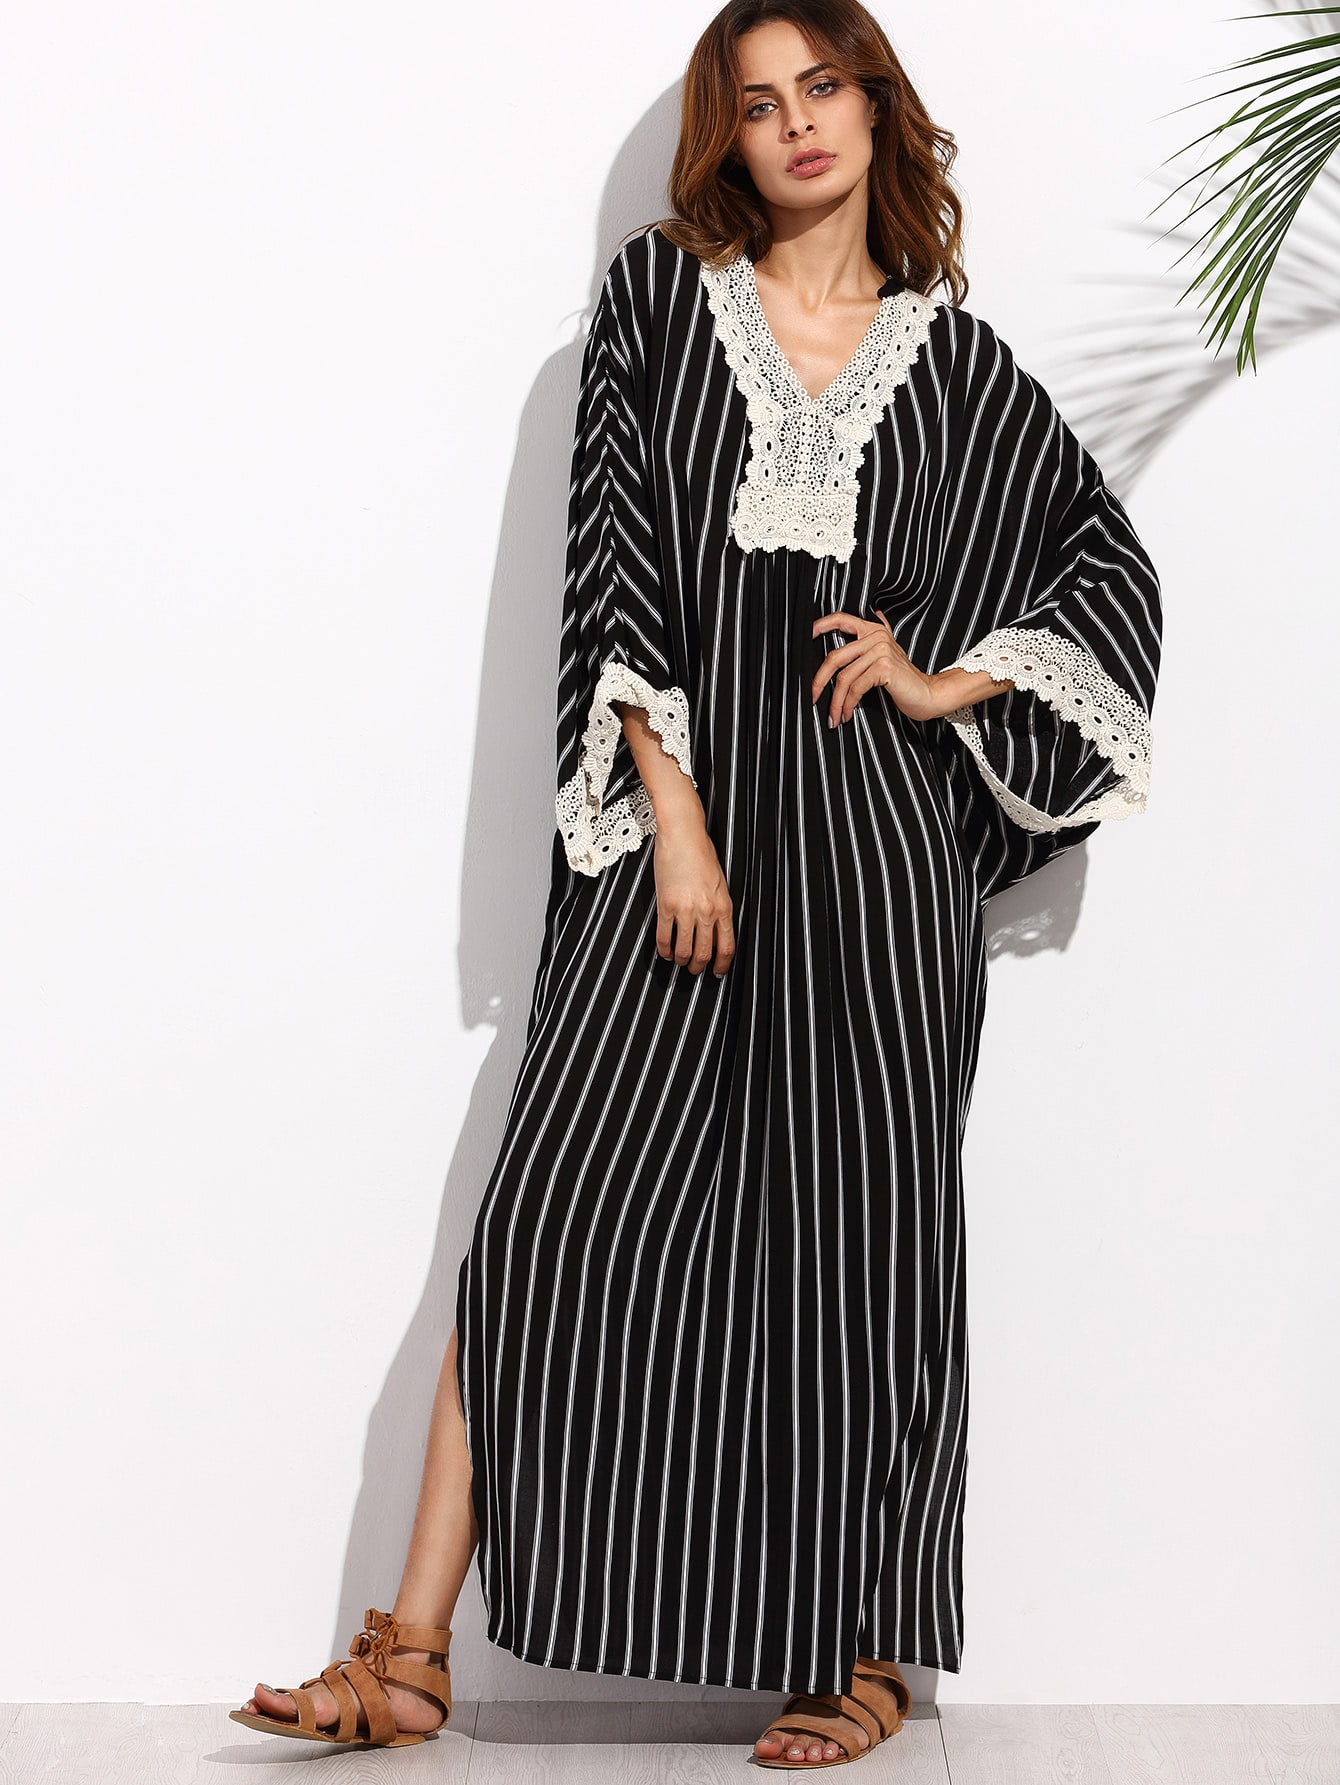 Vertical Striped Contrast Lace Kaftan Dress dress160726719